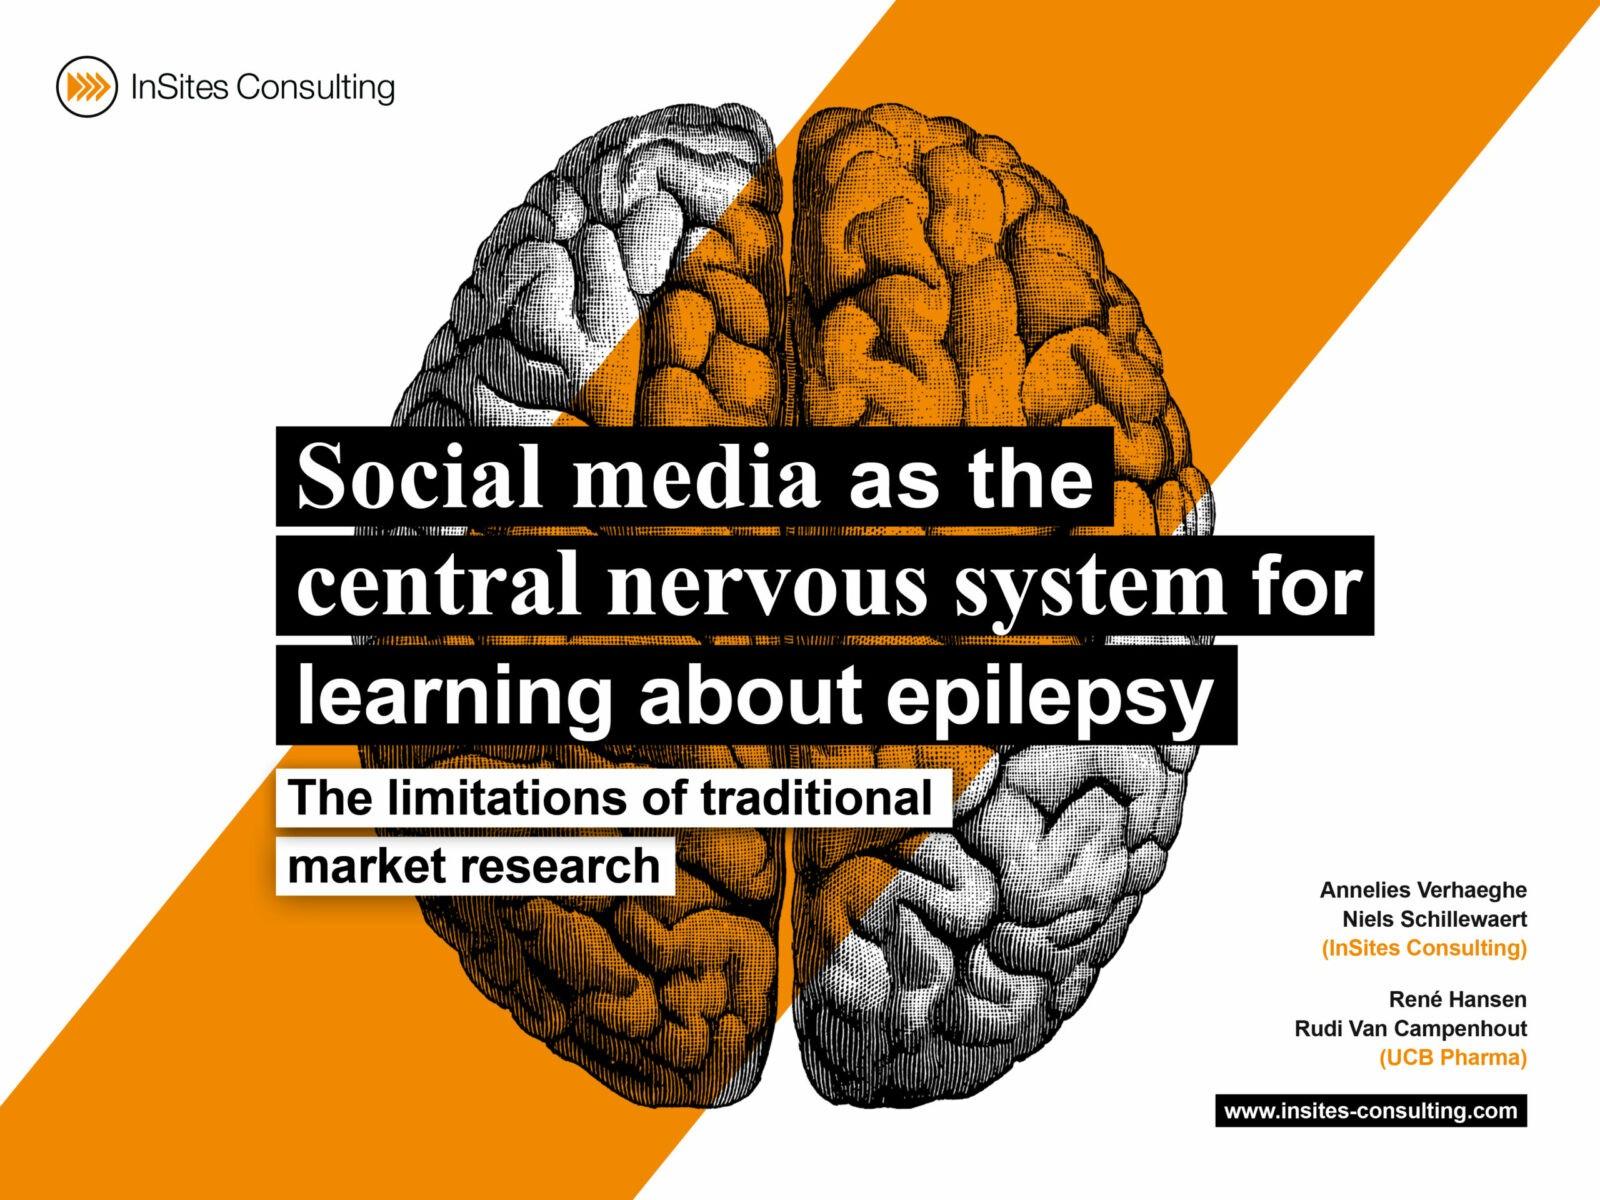 Social media netnography for epilepsy